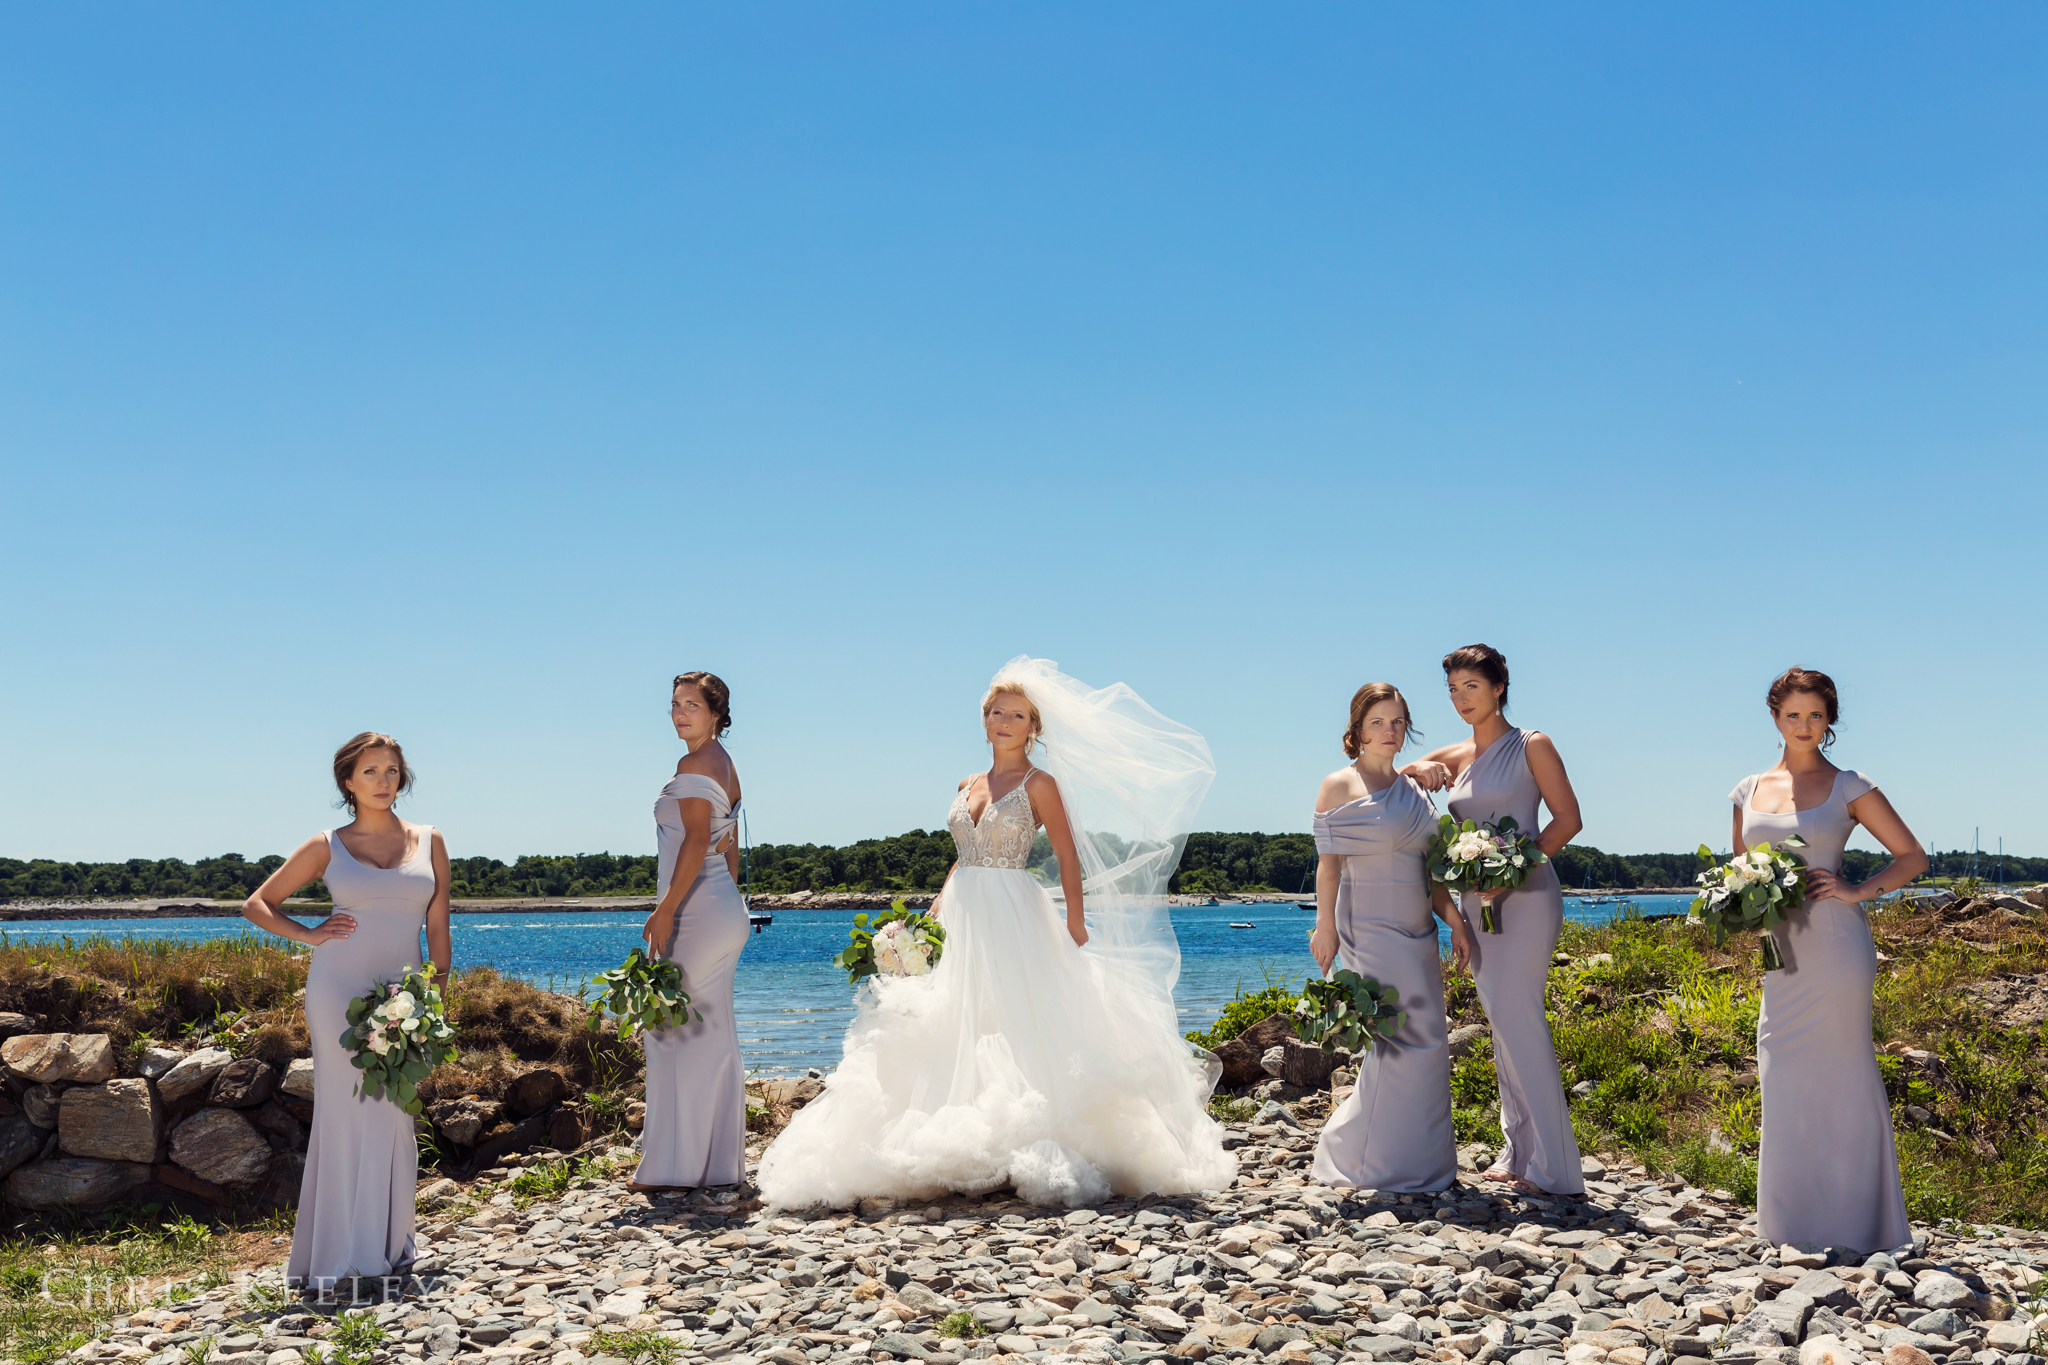 wentworth-portsmouth-new-hampshire-wedding-photographer-43.jpg